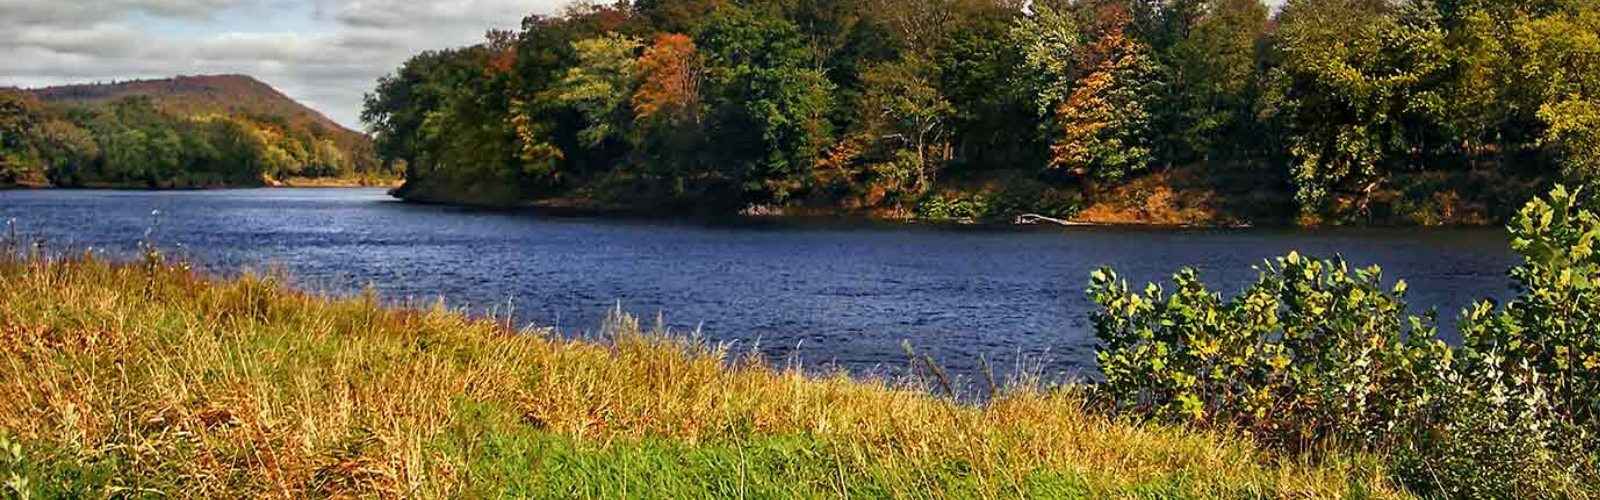 Delaware River Floodplain   Photo by Nicholas Tonelli